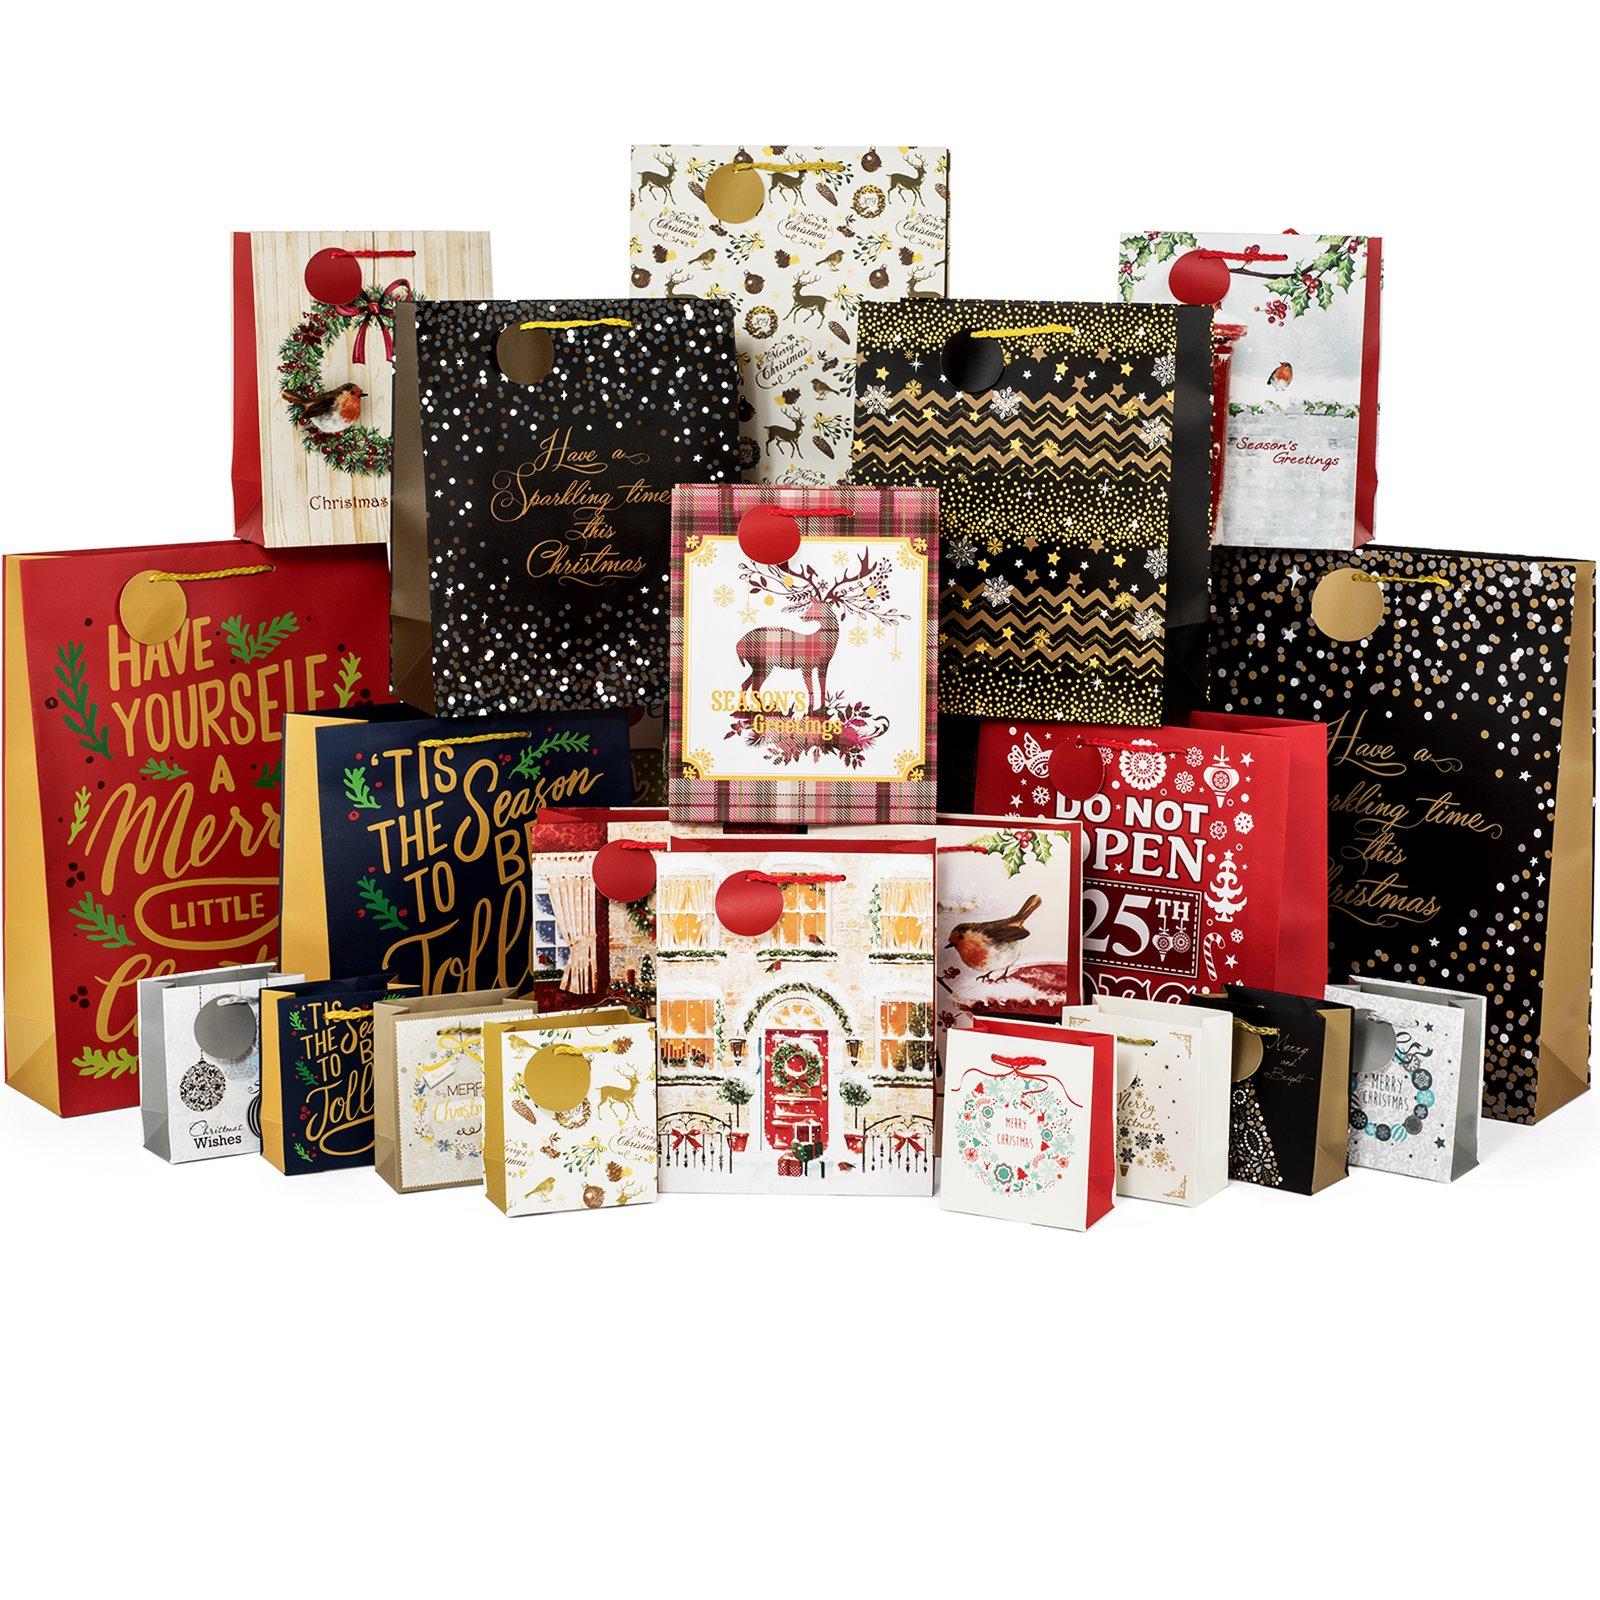 24 Count Christmas Gift Bags Bulk Set Includes 4 Jumbo 6 Large 6 Medium 8 Small  sc 1 st  Amazon.com & Bulk Christmas Gifts: Amazon.com